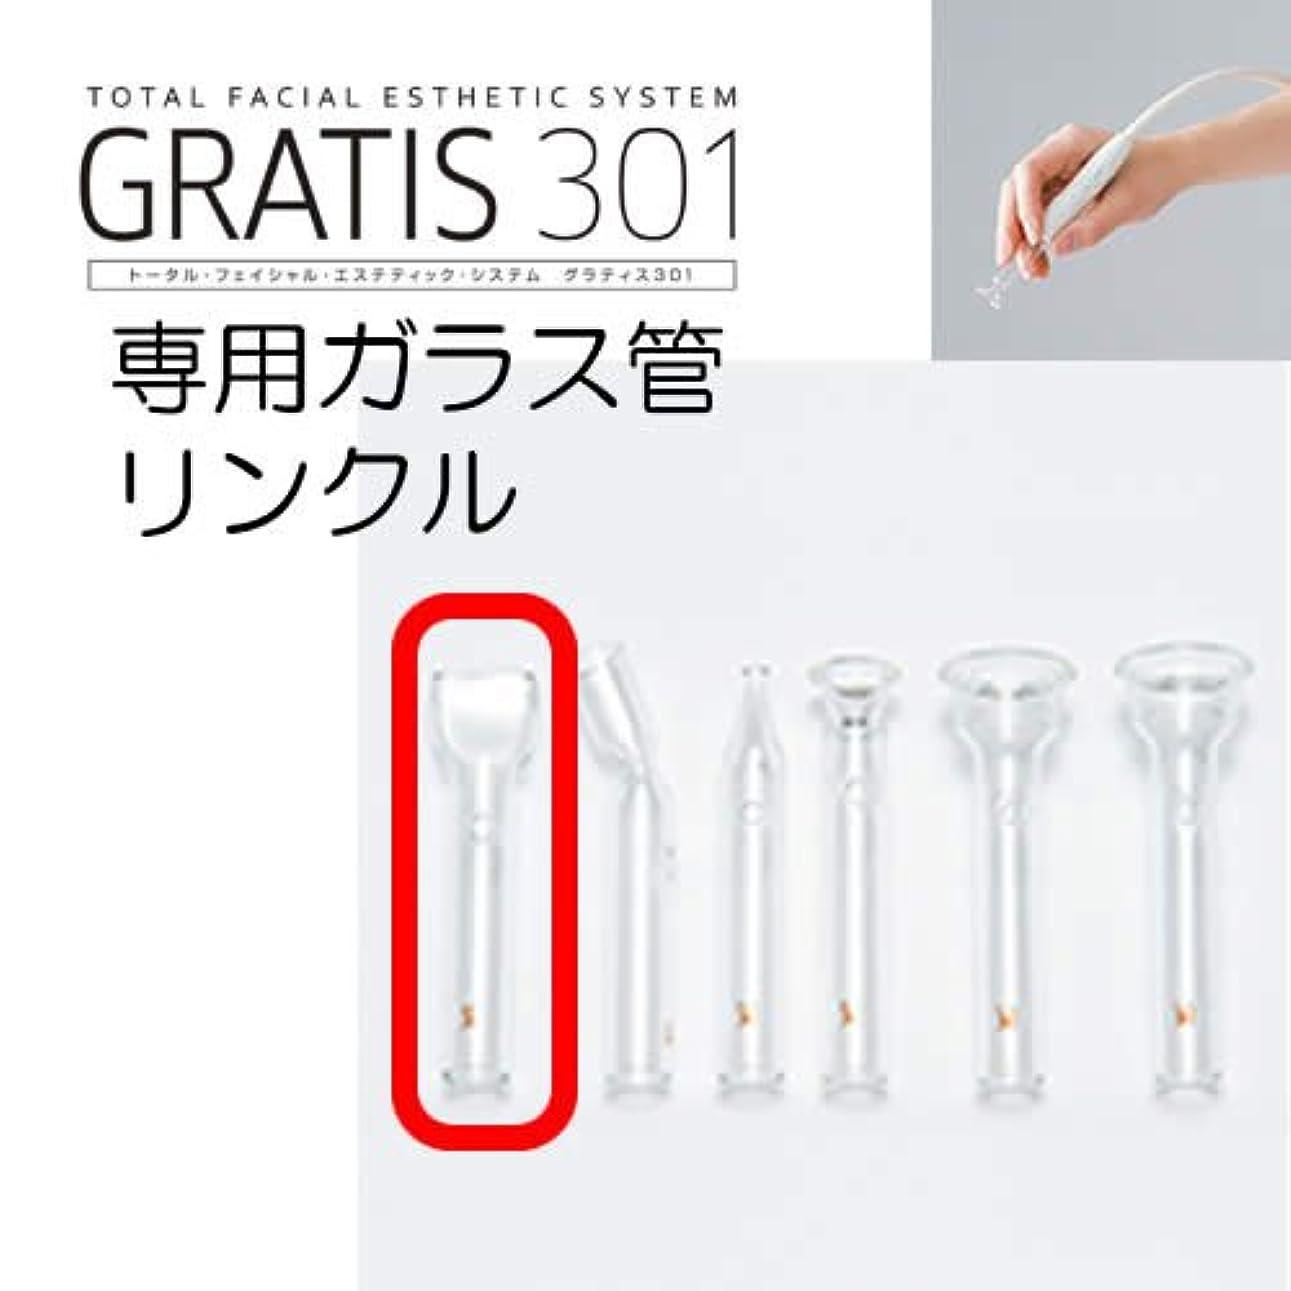 GRATIS 301(グラティス301)専用ガラス管 リンクル(2本セット)